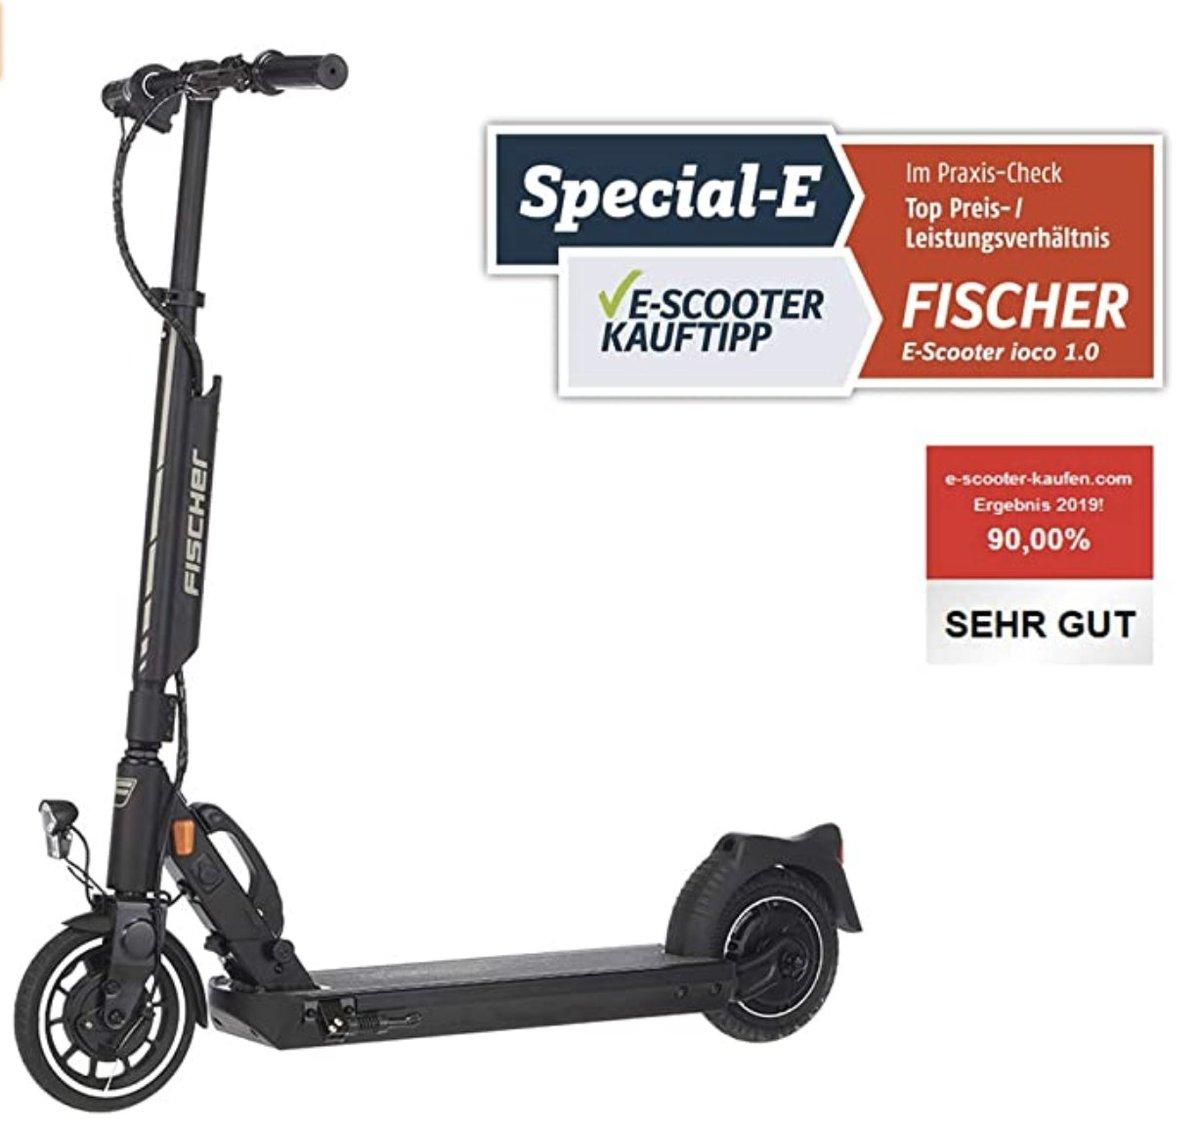 €200 Discount — Fischer E-Scooter Elektroroller ioco 1.0 mit Straßenzulassung des KBA •DE https://amzn.to/2DcnrUb pic.twitter.com/LlL4m9i4vk  by Geek Discounts